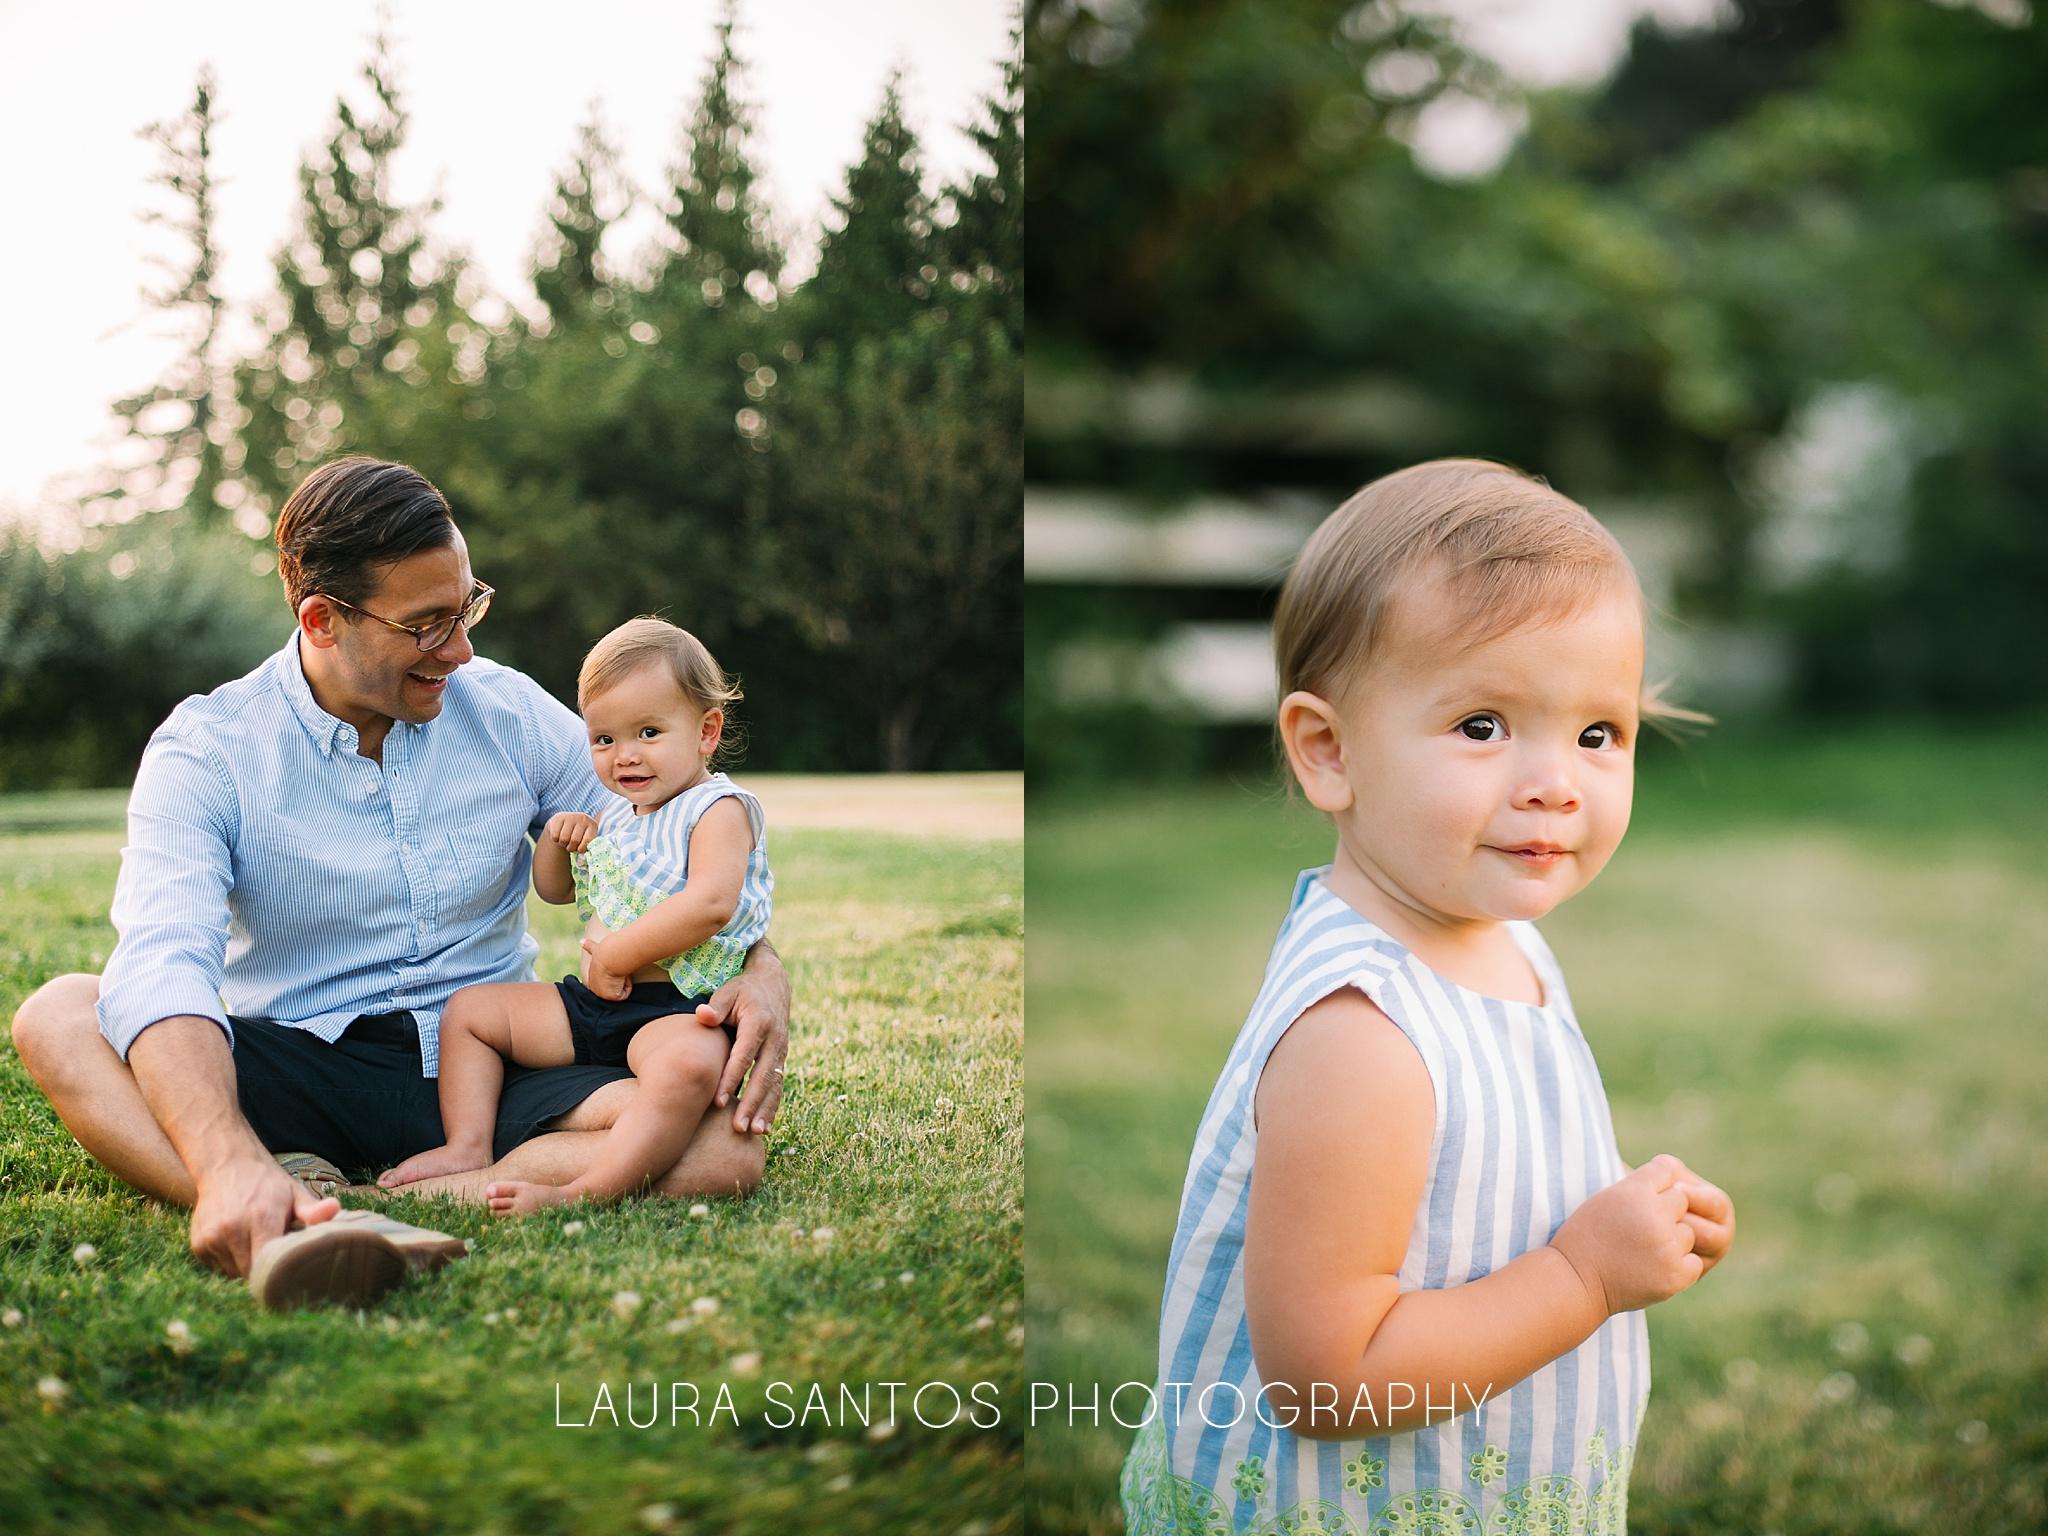 Laura Santos Photography Portland Oregon Family Photographer_0542.jpg